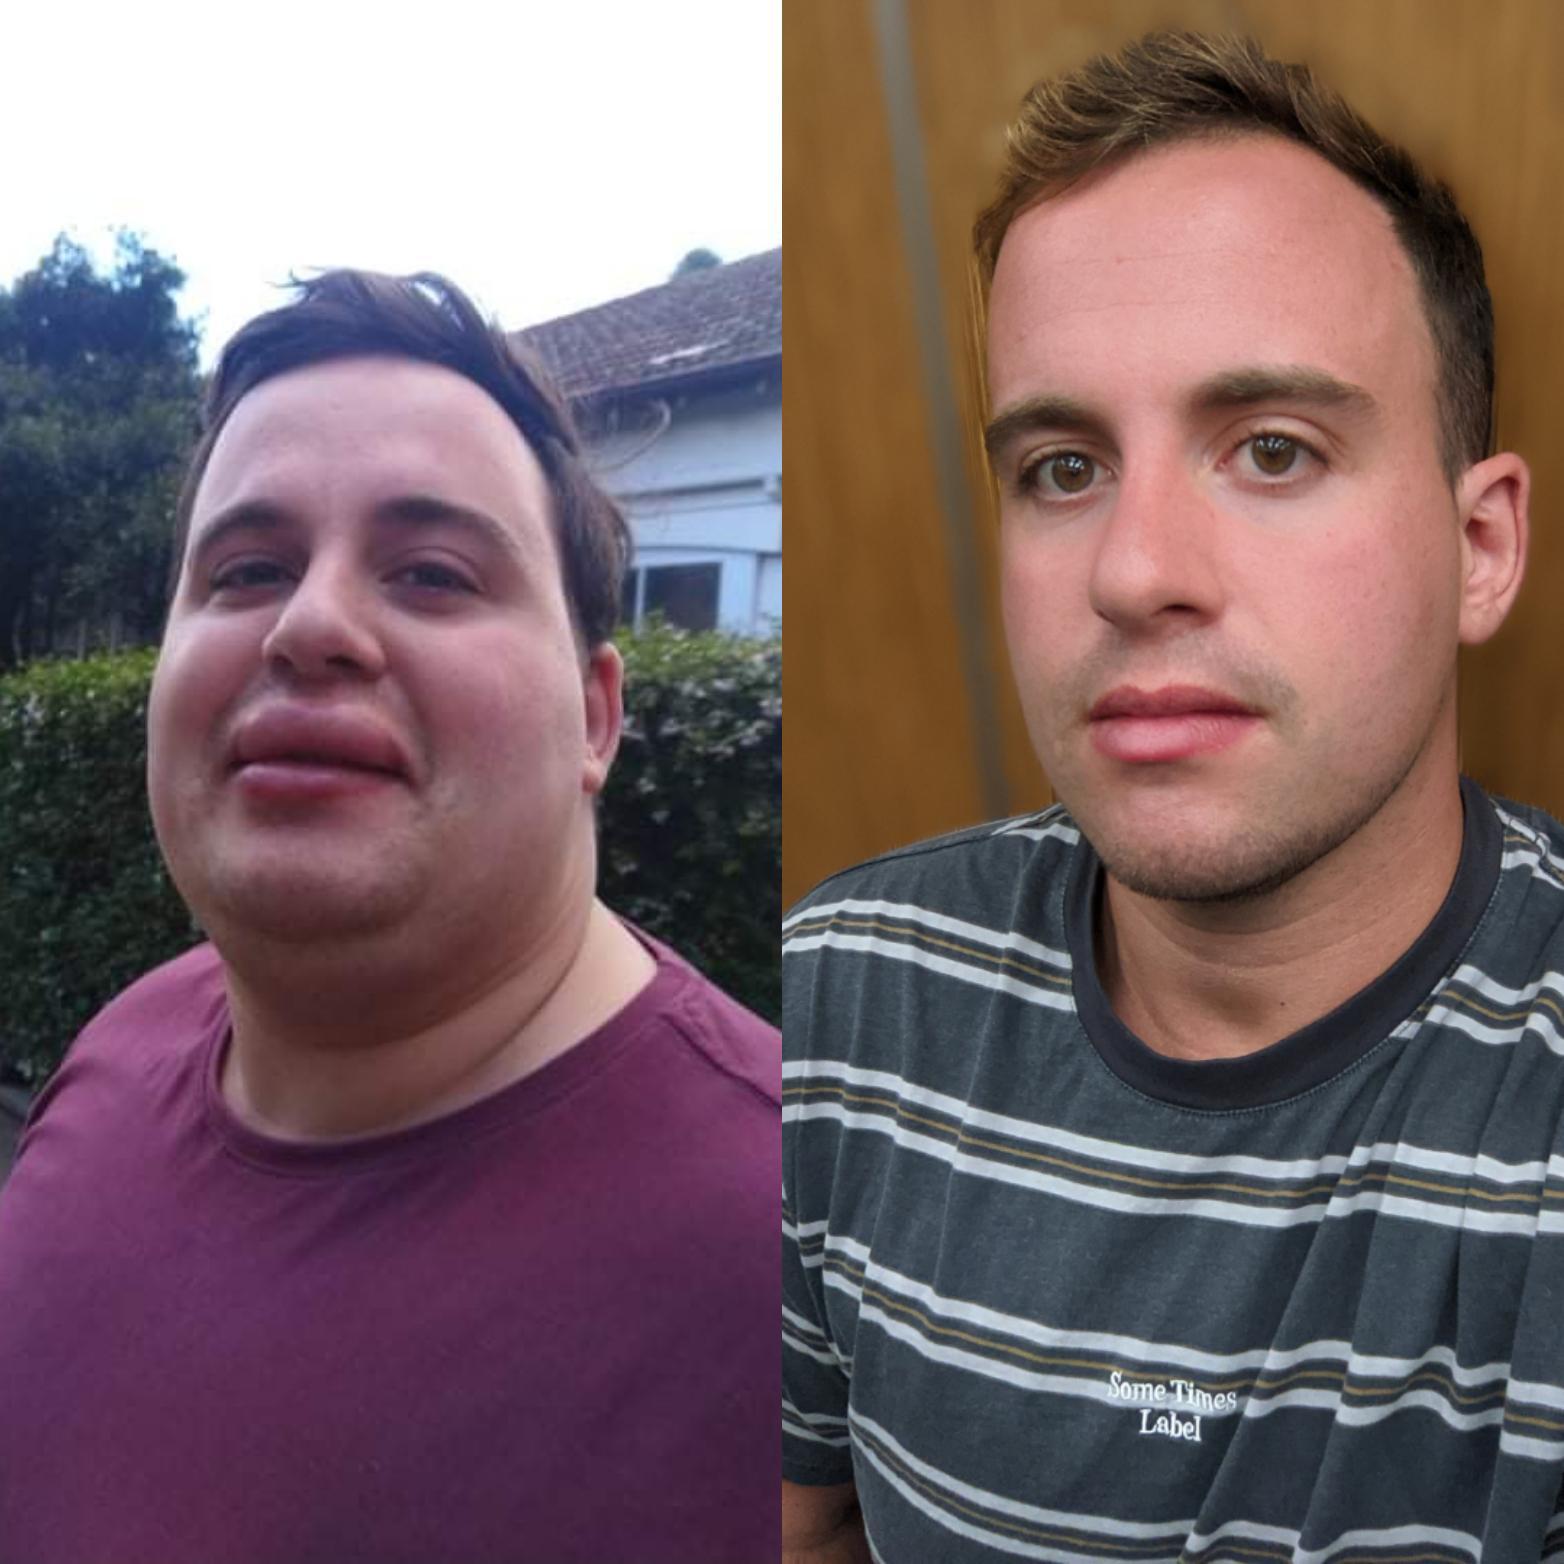 6 feet 1 Male Progress Pics of 135 lbs Weight Loss 350 lbs to 215 lbs